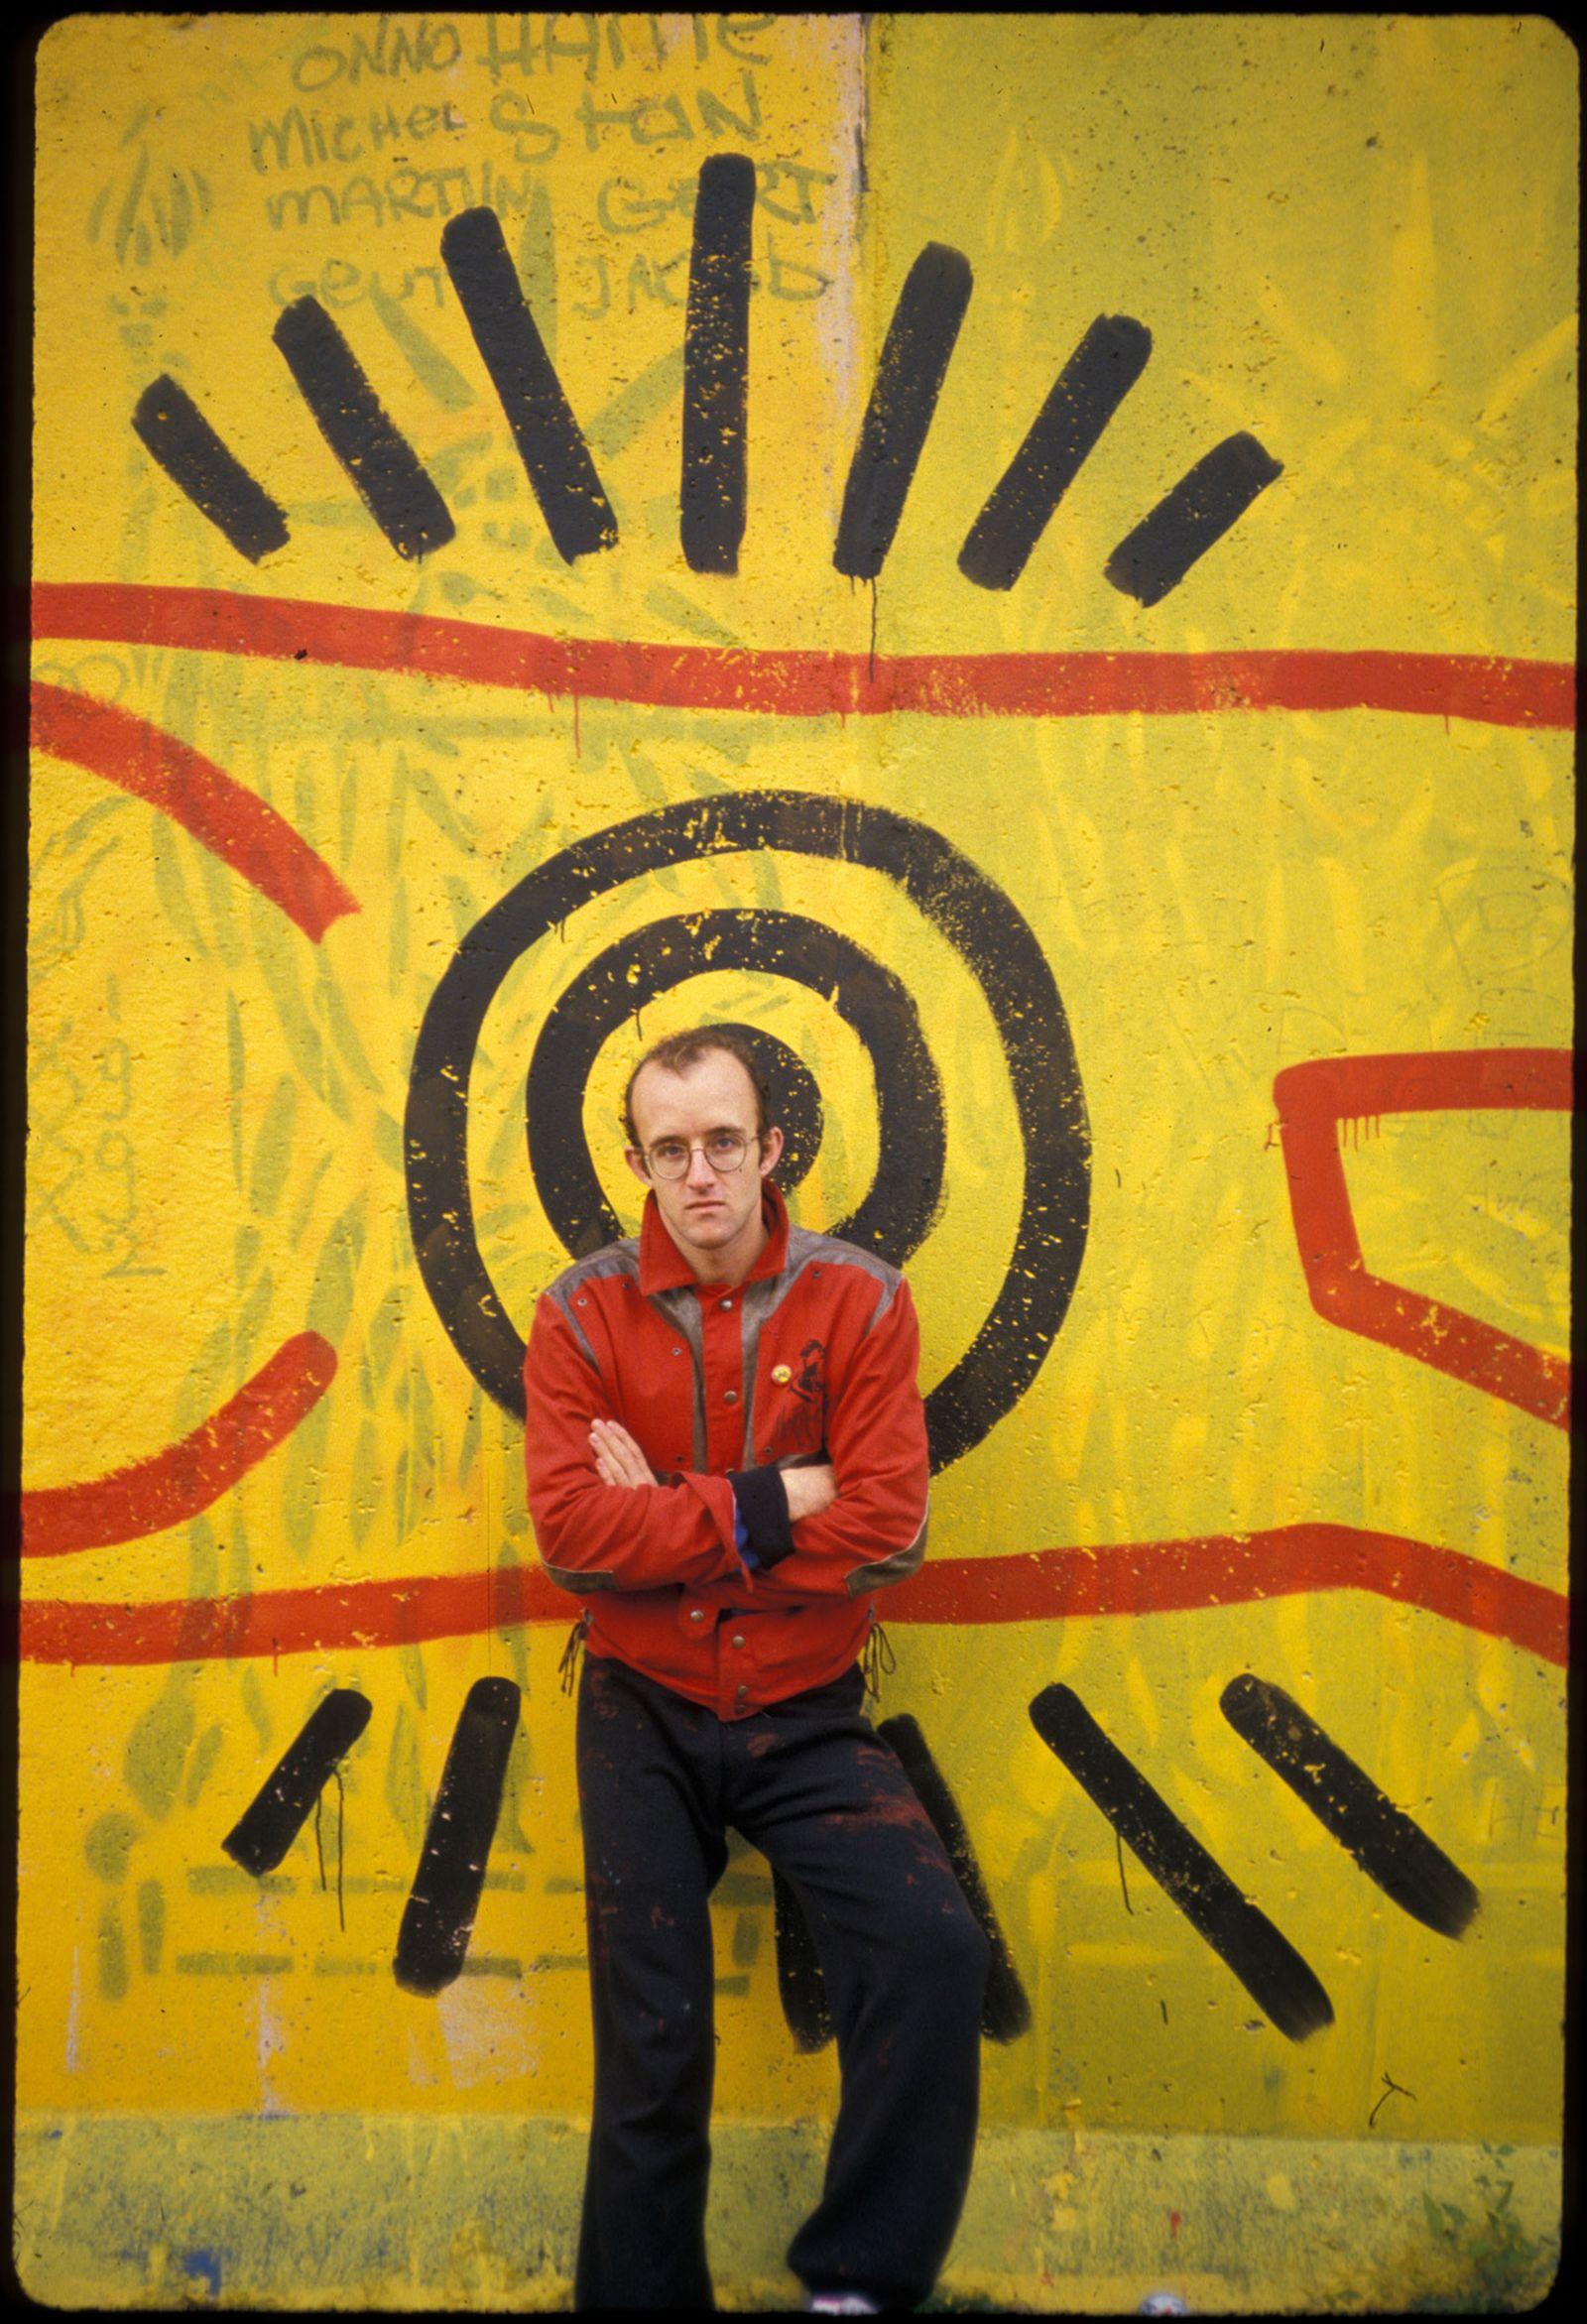 Keith Haring mural at Berlin Wall, Berlin, 1986